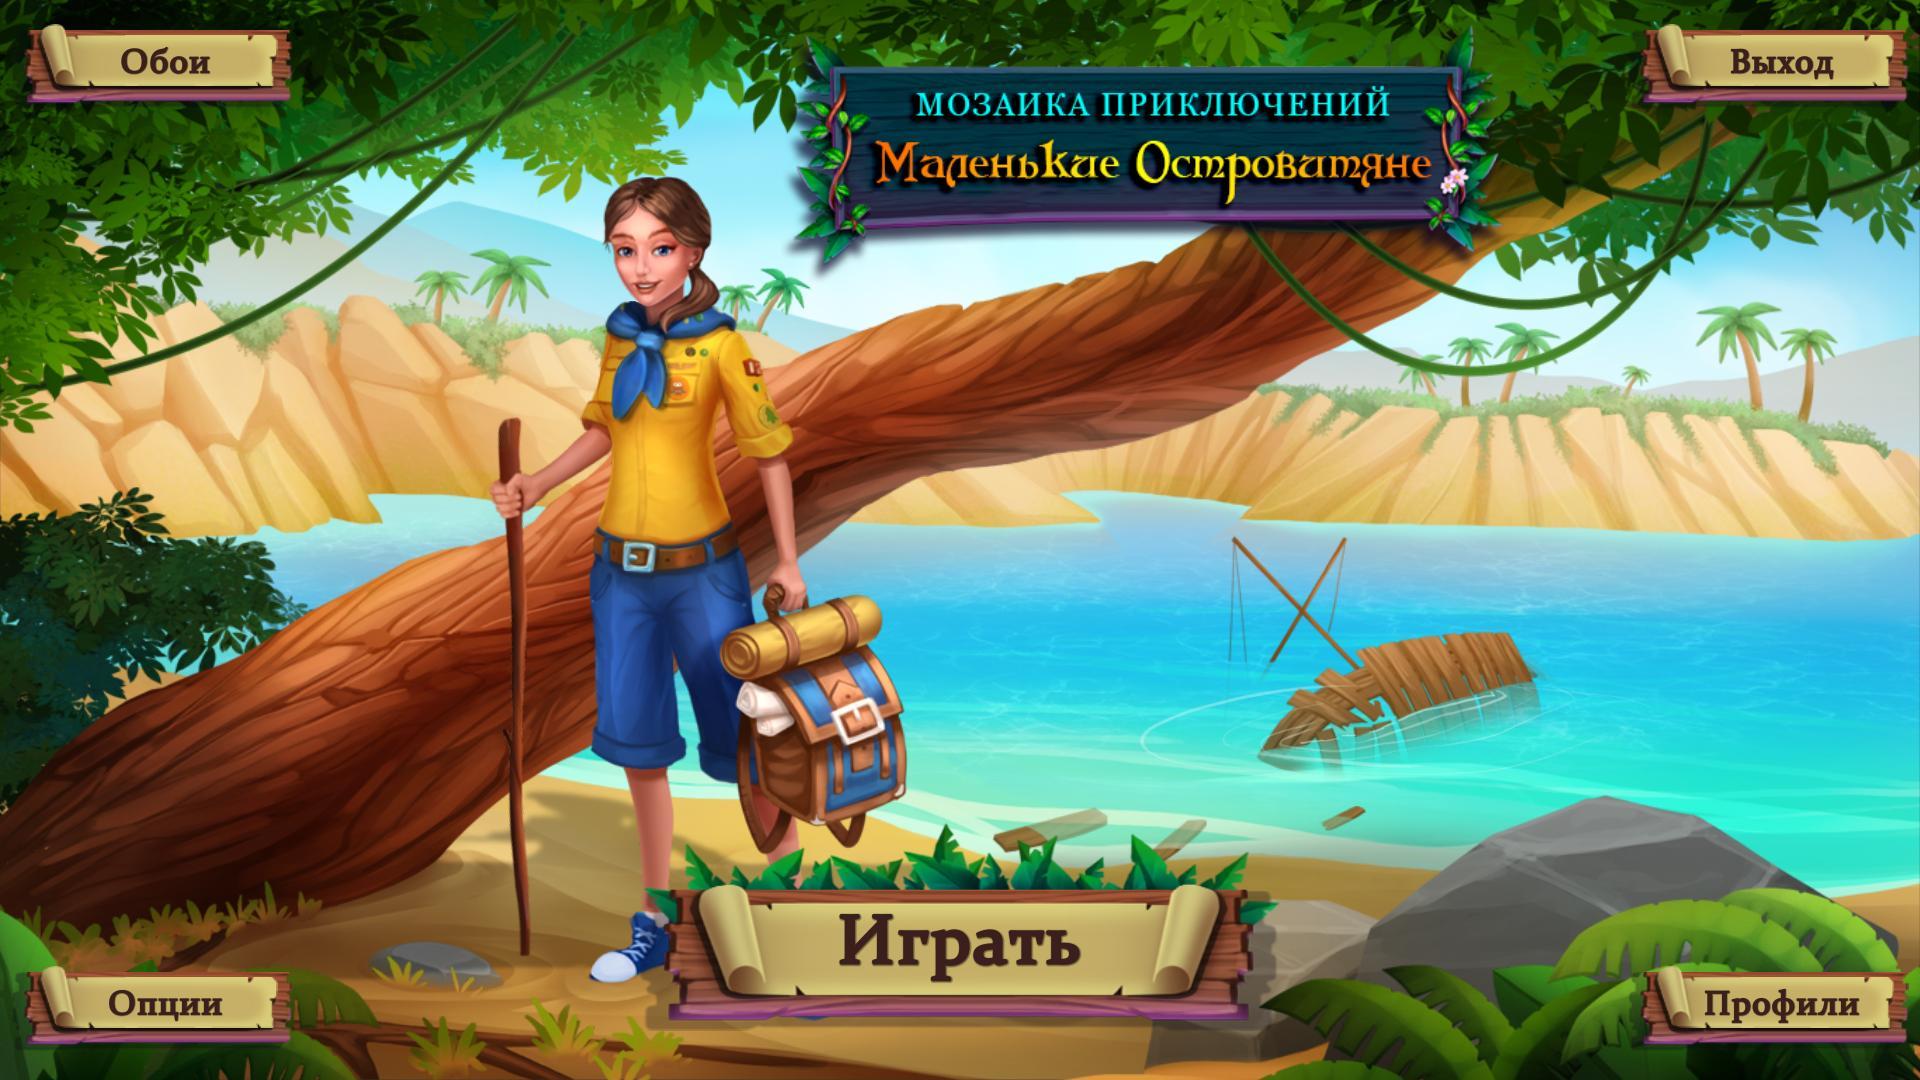 Мозаика приключений 2: Маленькие Островитяне | Adventure Mosaics 2: Small Islanders (Rus)